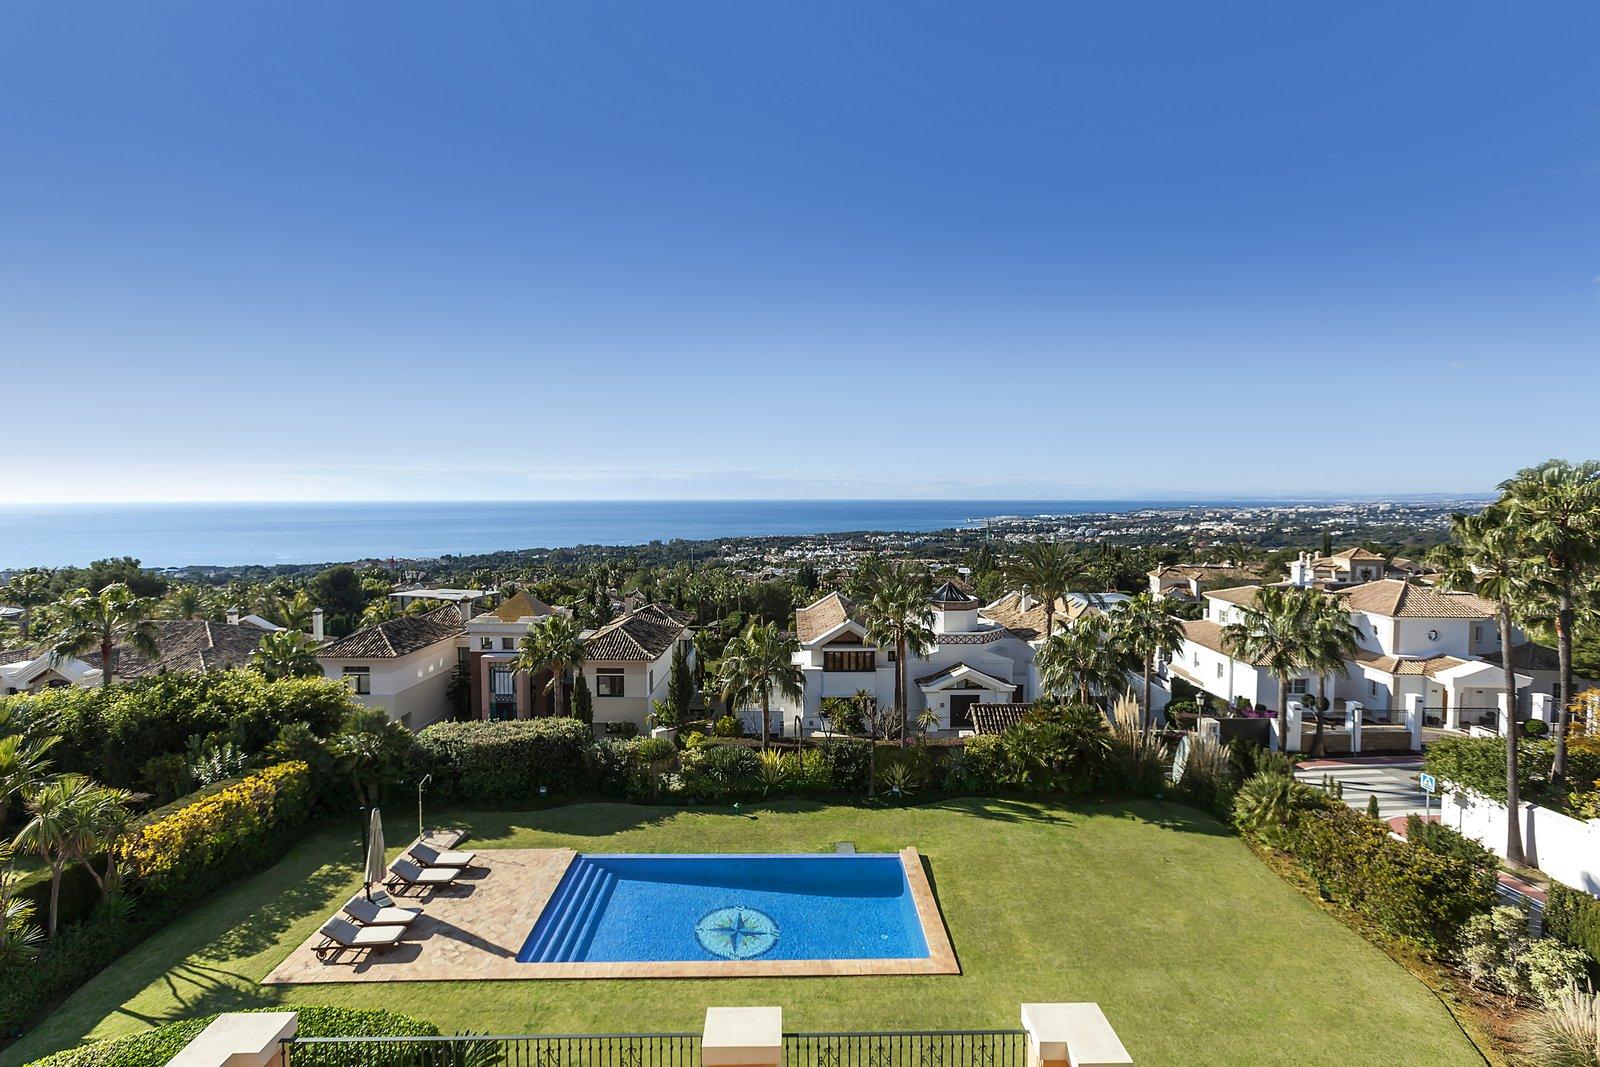 Sierra Blanca: urbanisation privée dans les collines de Marbella